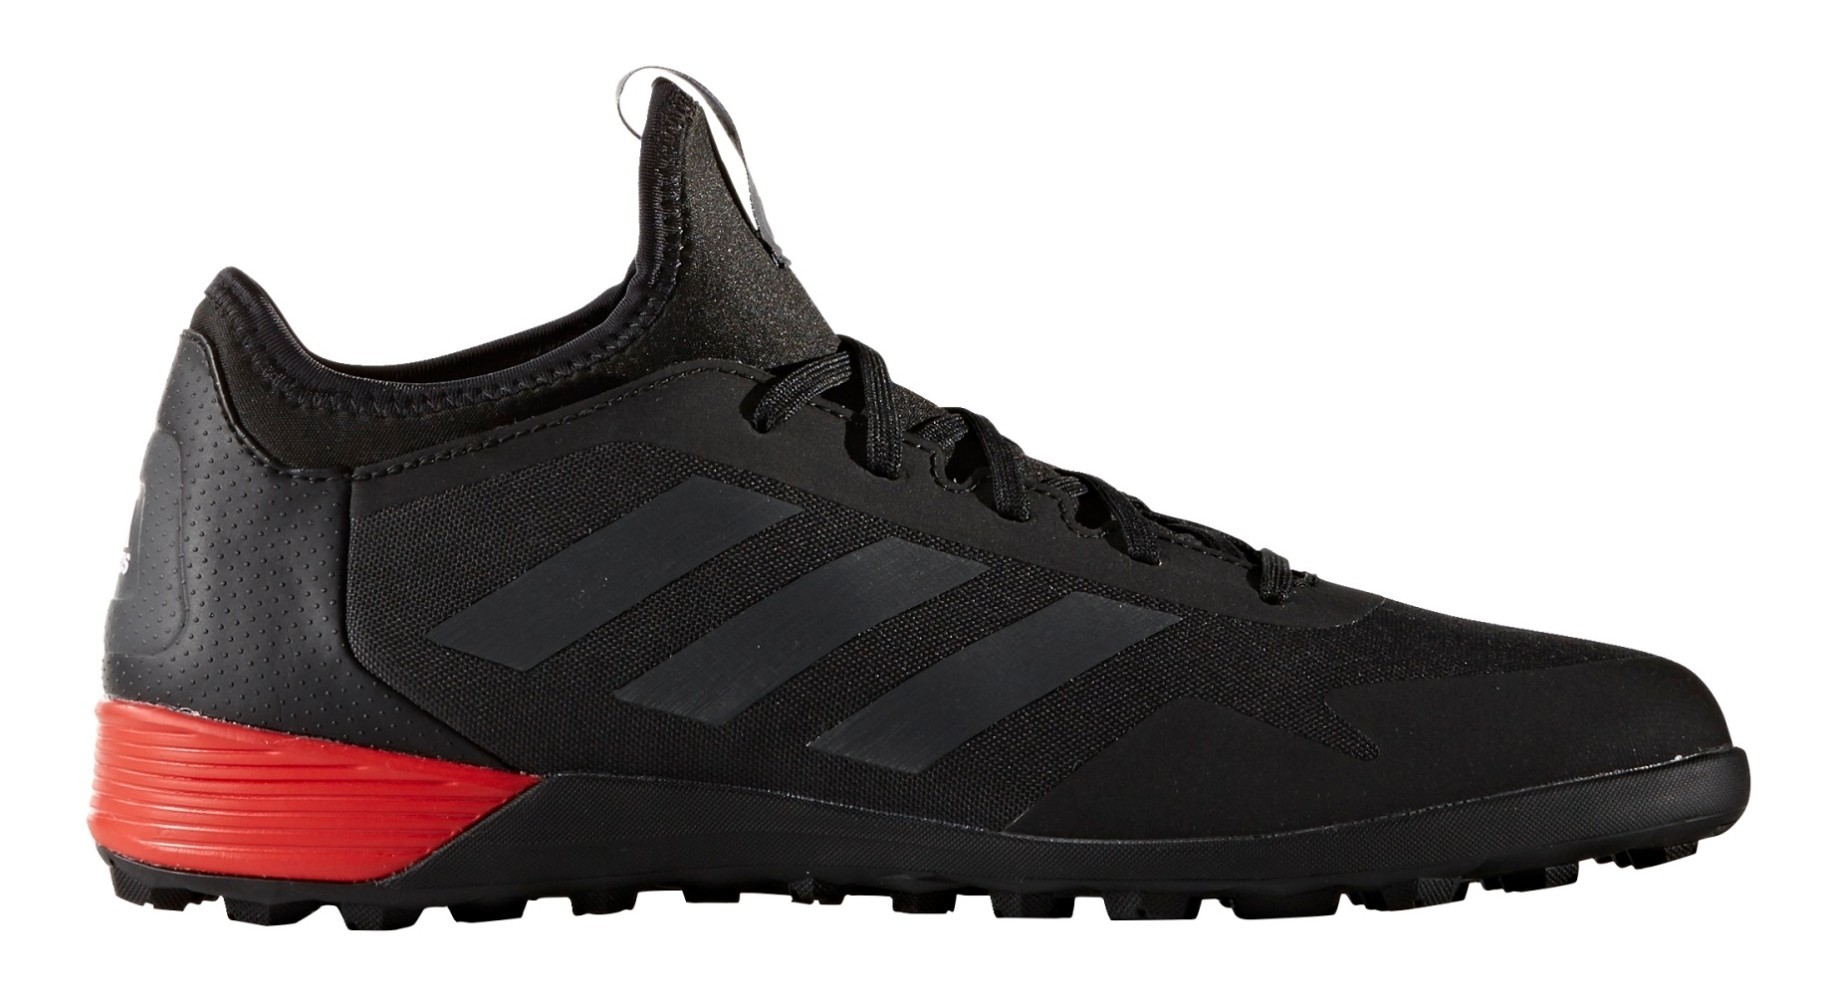 timeless design baf53 d4fb7 Shoes Soccer Adidas Ace Tango 17.2 TF colore Black Red - Adidas -  SportIT.com